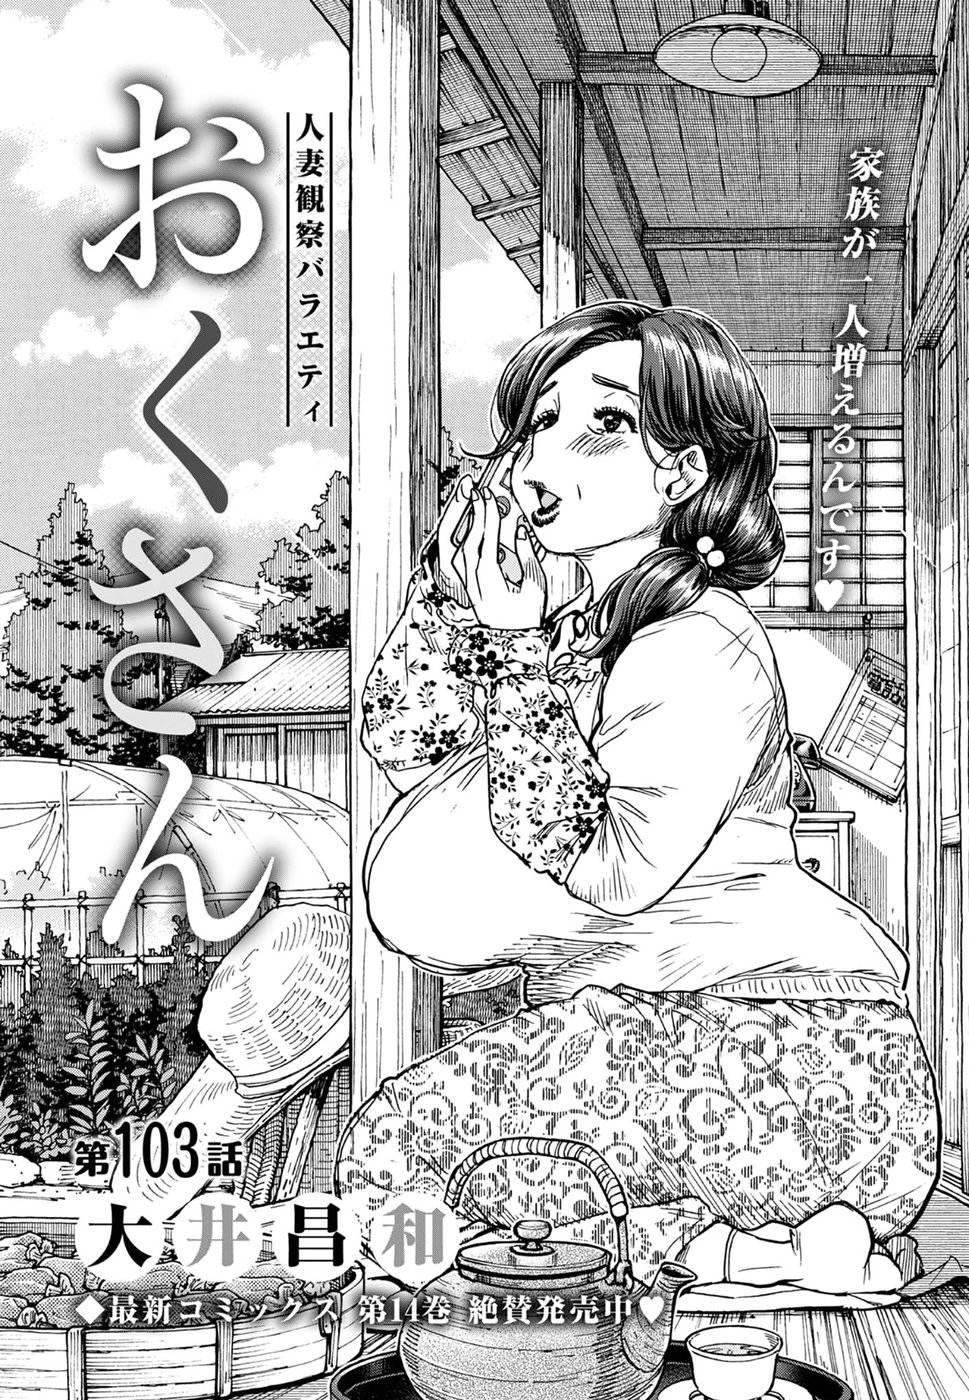 Okusan - Chapter 103 - Page 1